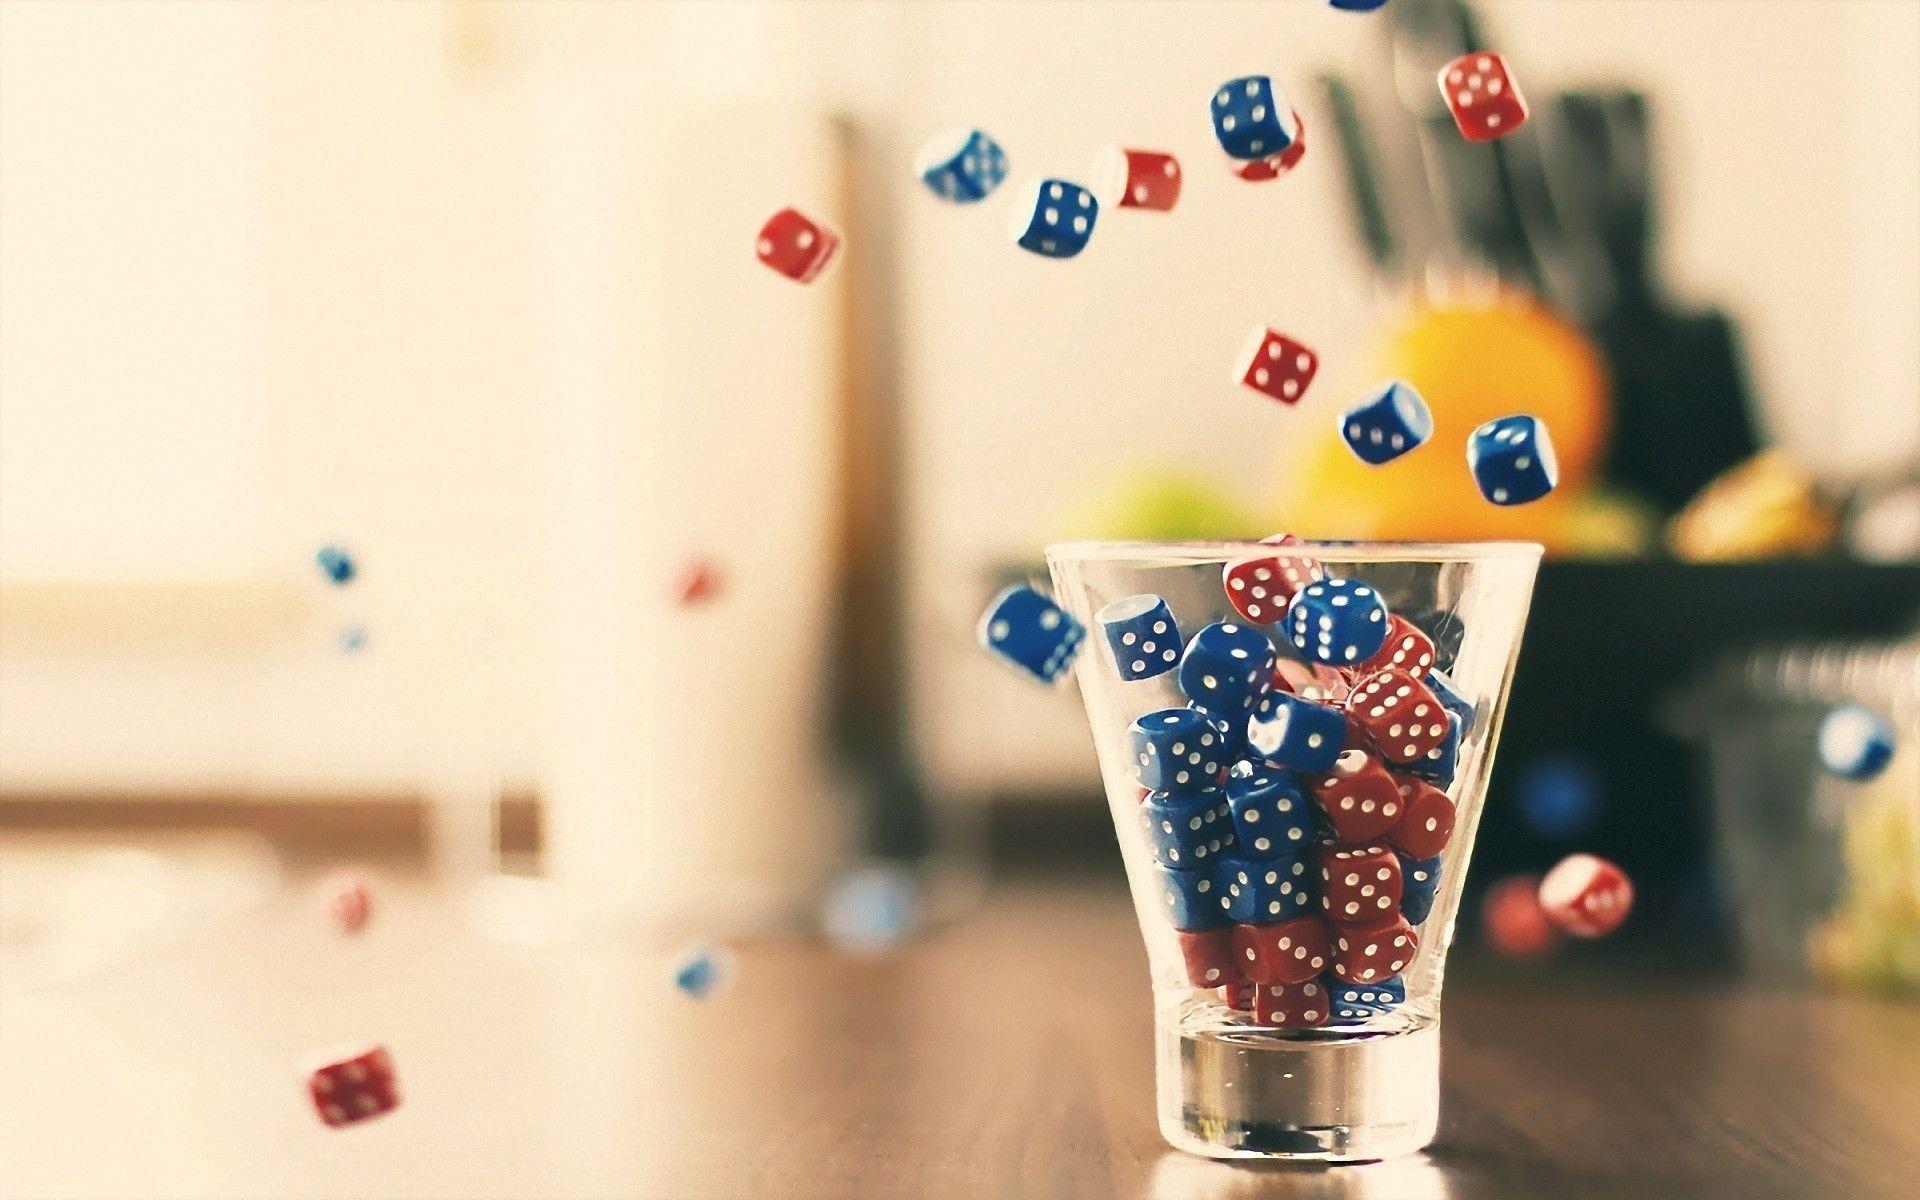 black dice wallpaper high resolution